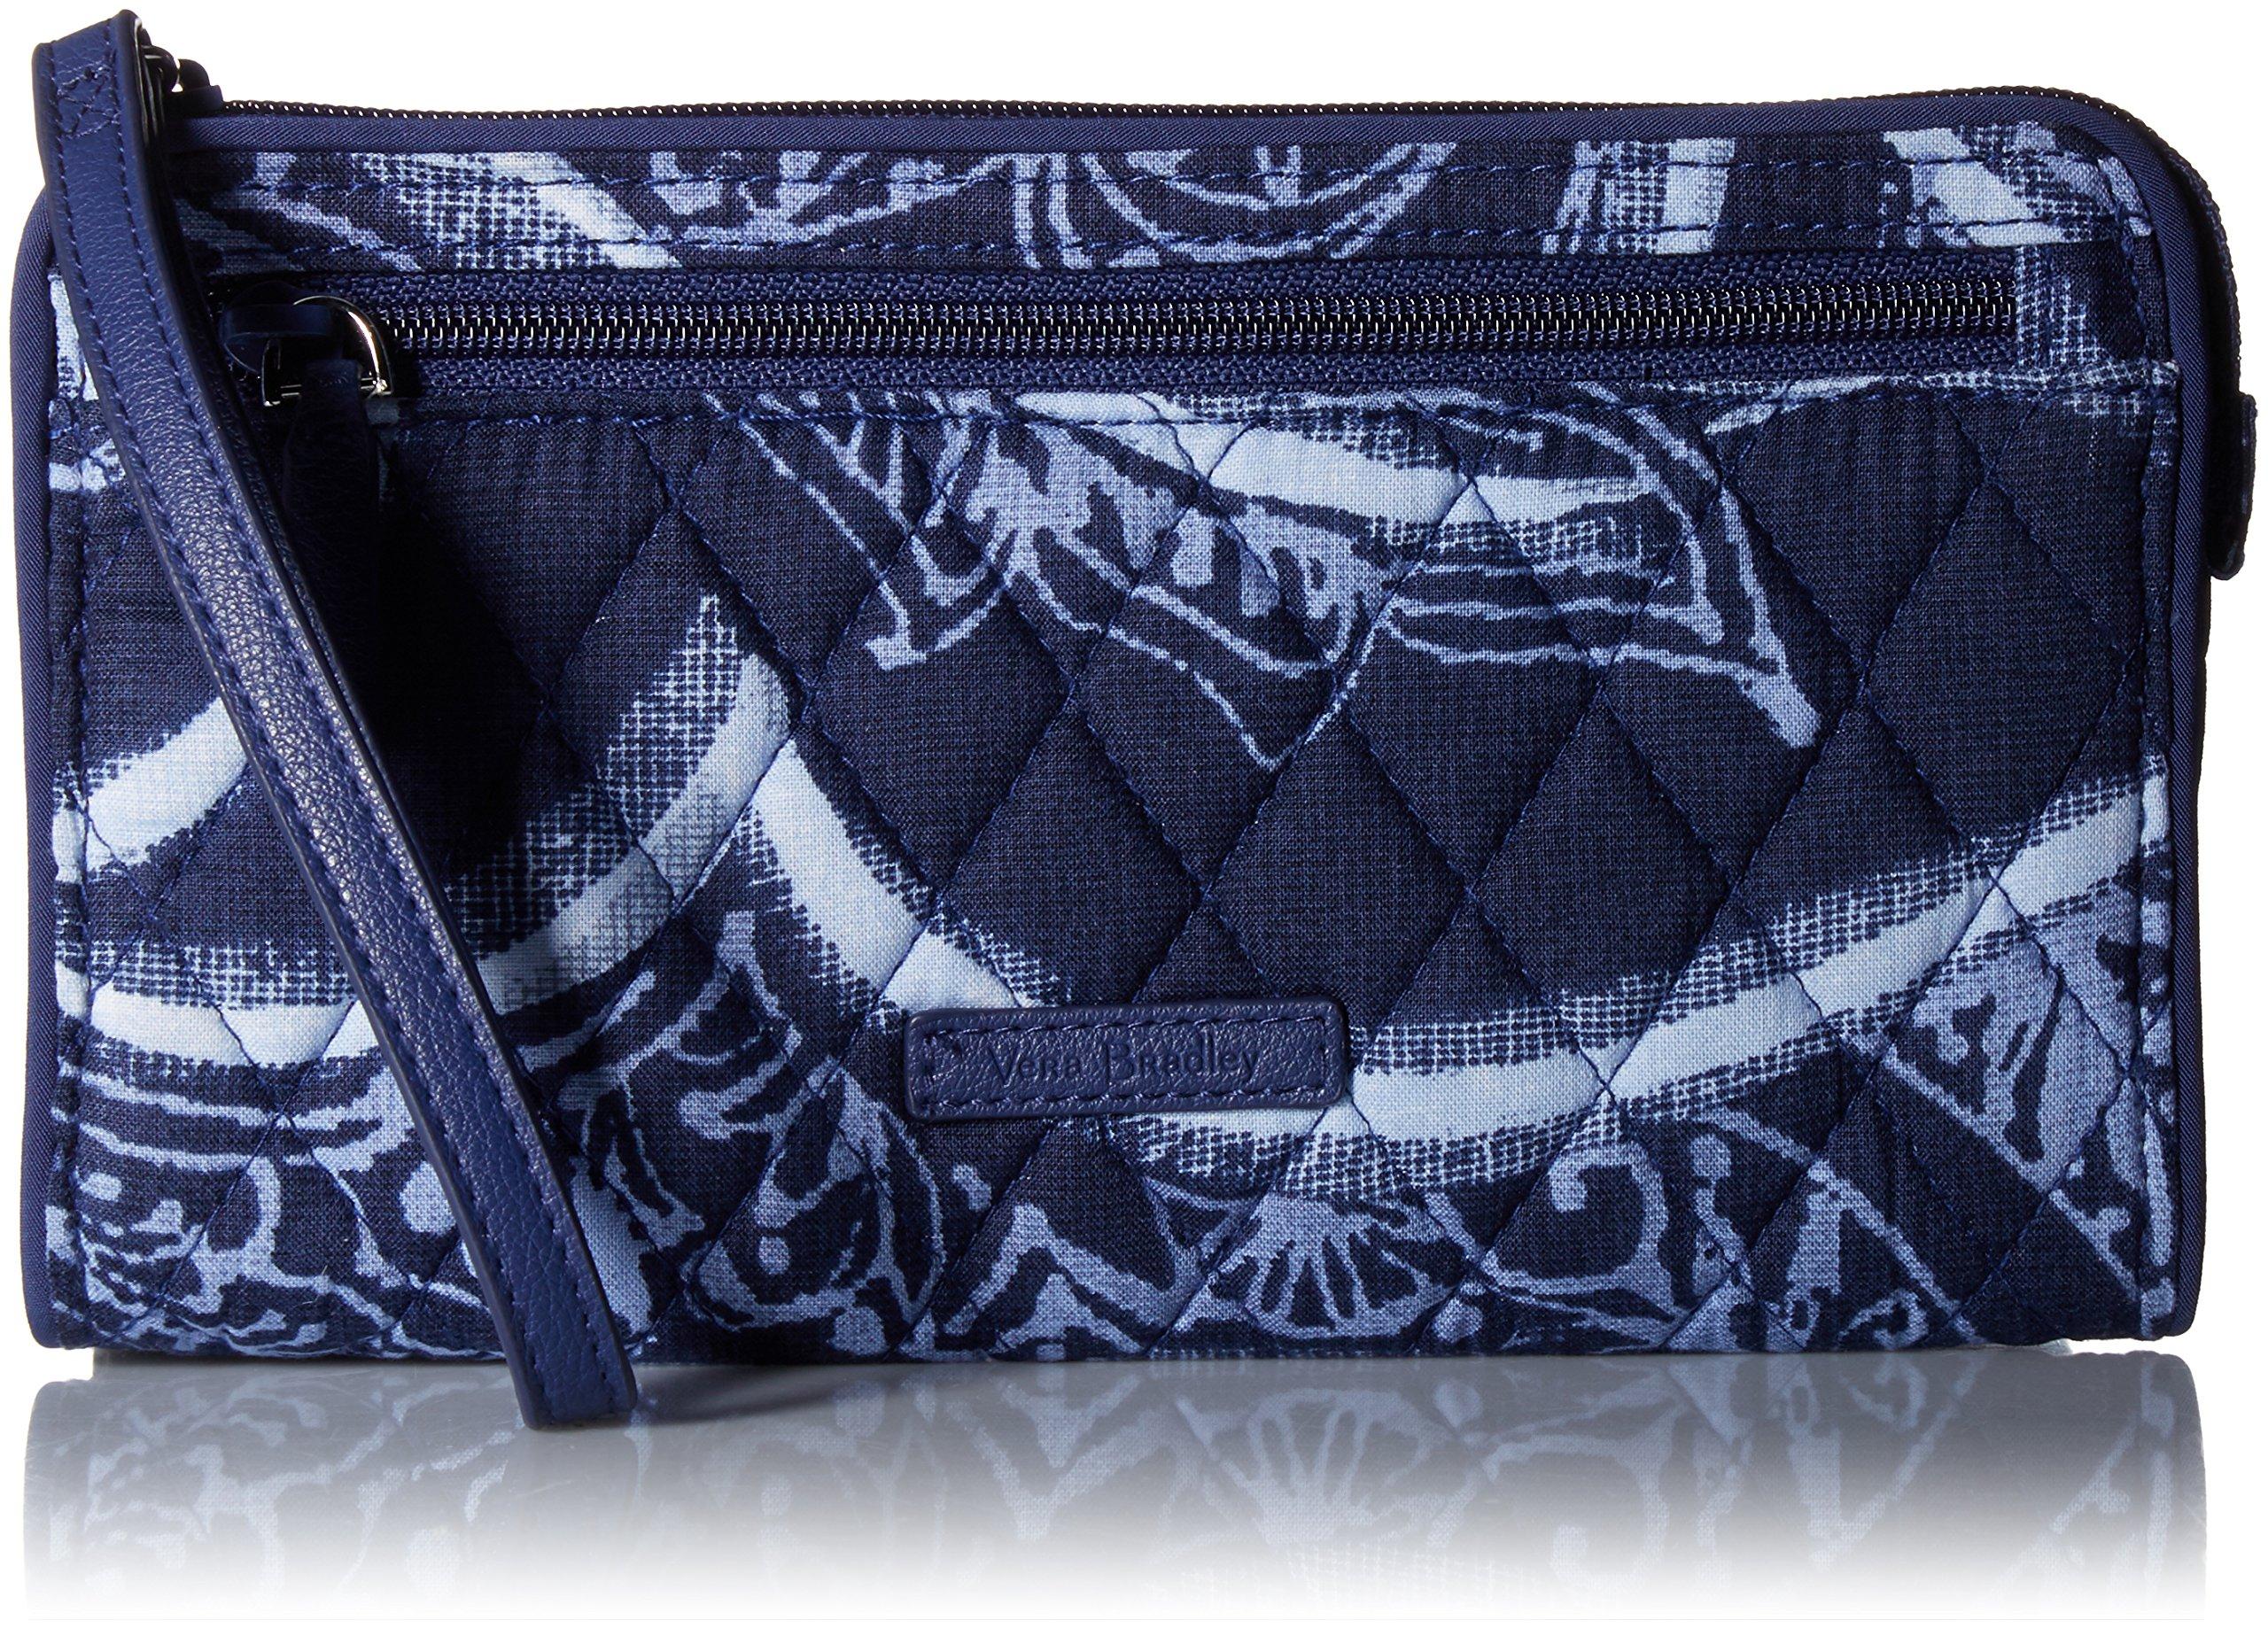 Vera Bradley Rfid Front Zip Wristlet, Signature Cotton,One Size,Indigo